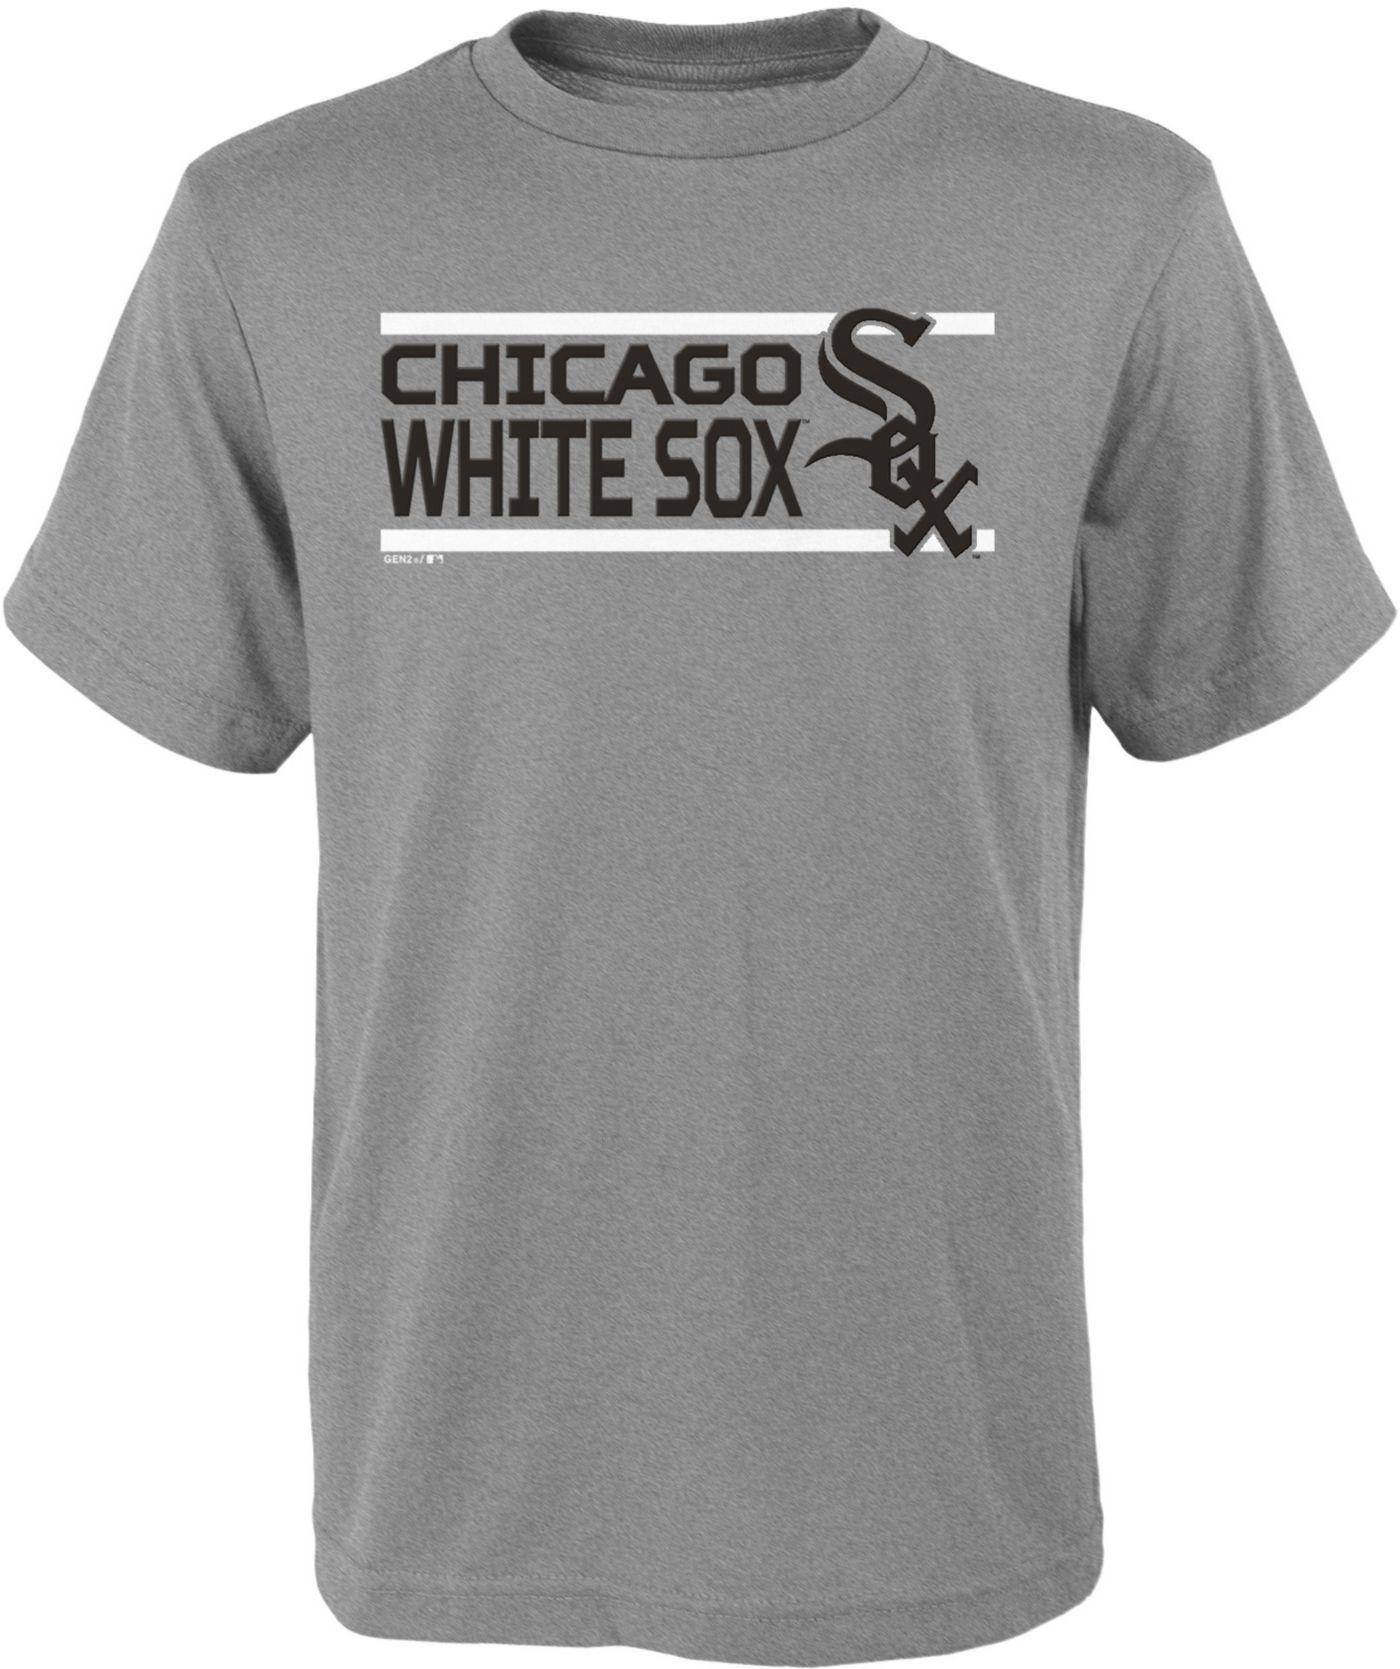 Gen2 Youth Chicago White Sox Dri-Tek Grey T-Shirt